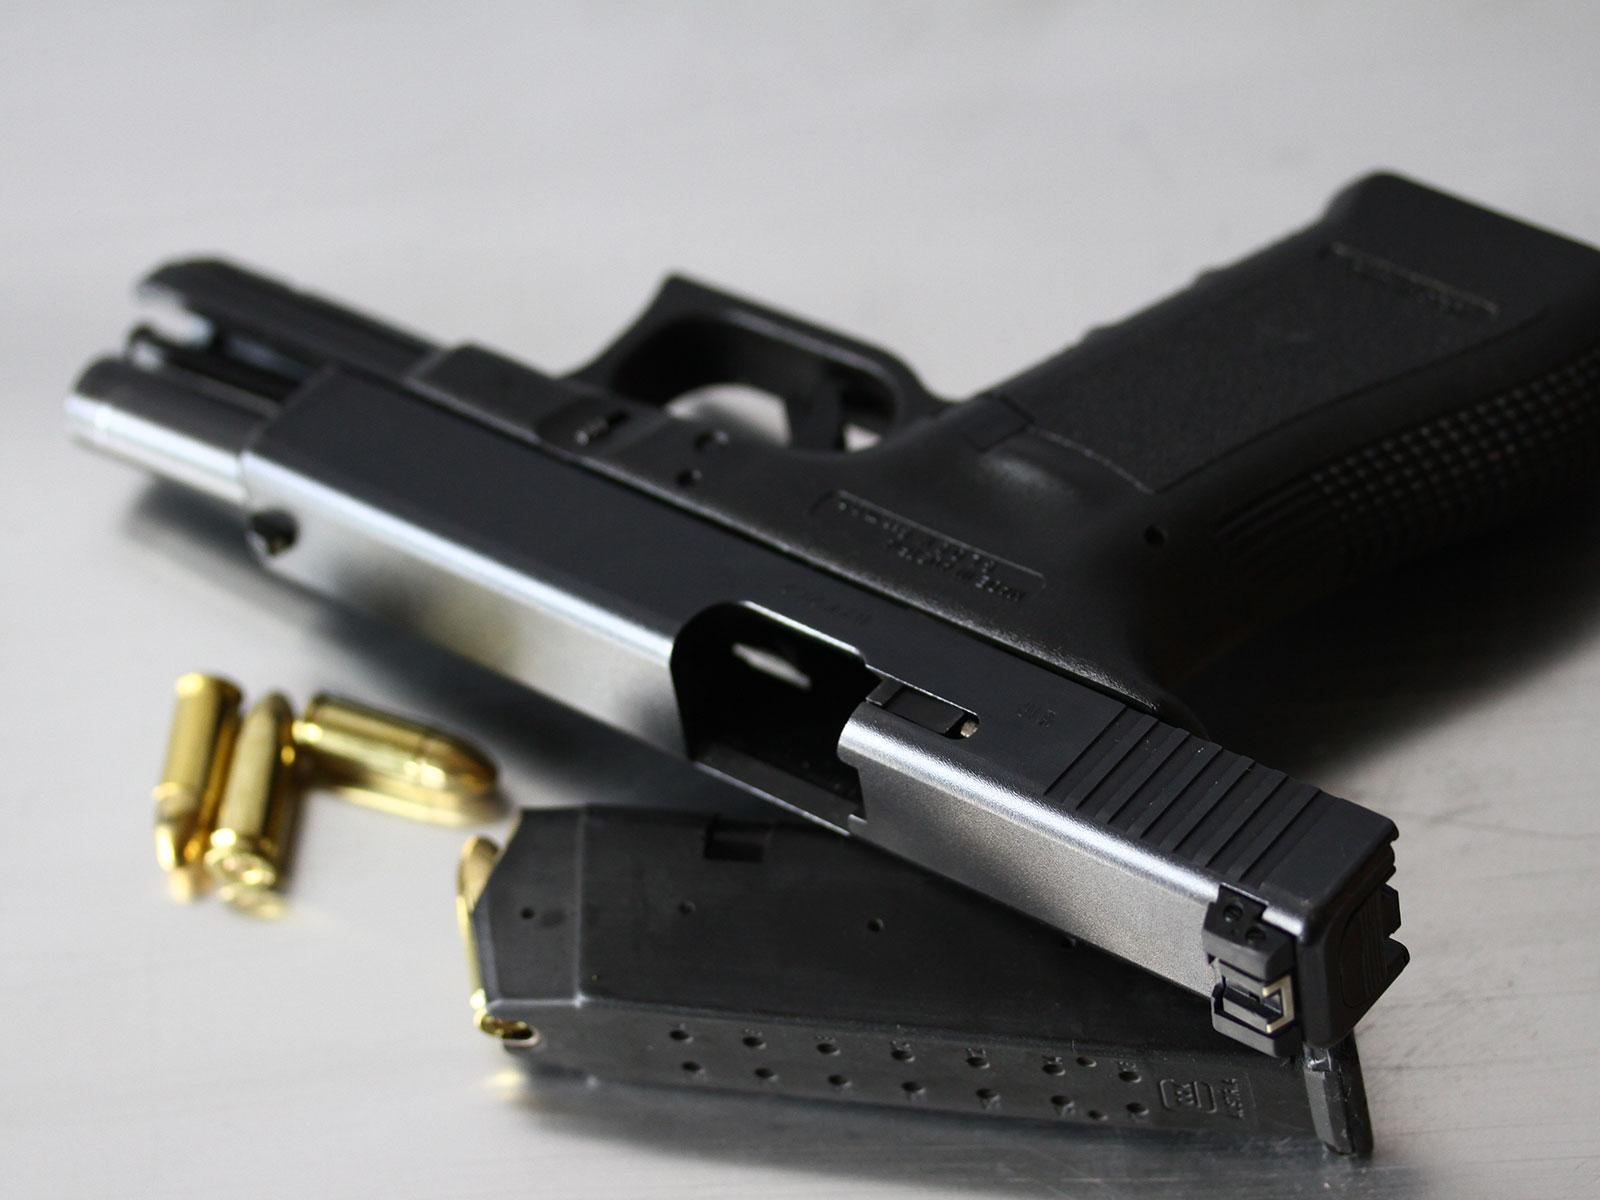 SH_Web_Wir_Waffen_Glock17-5_1800x1200